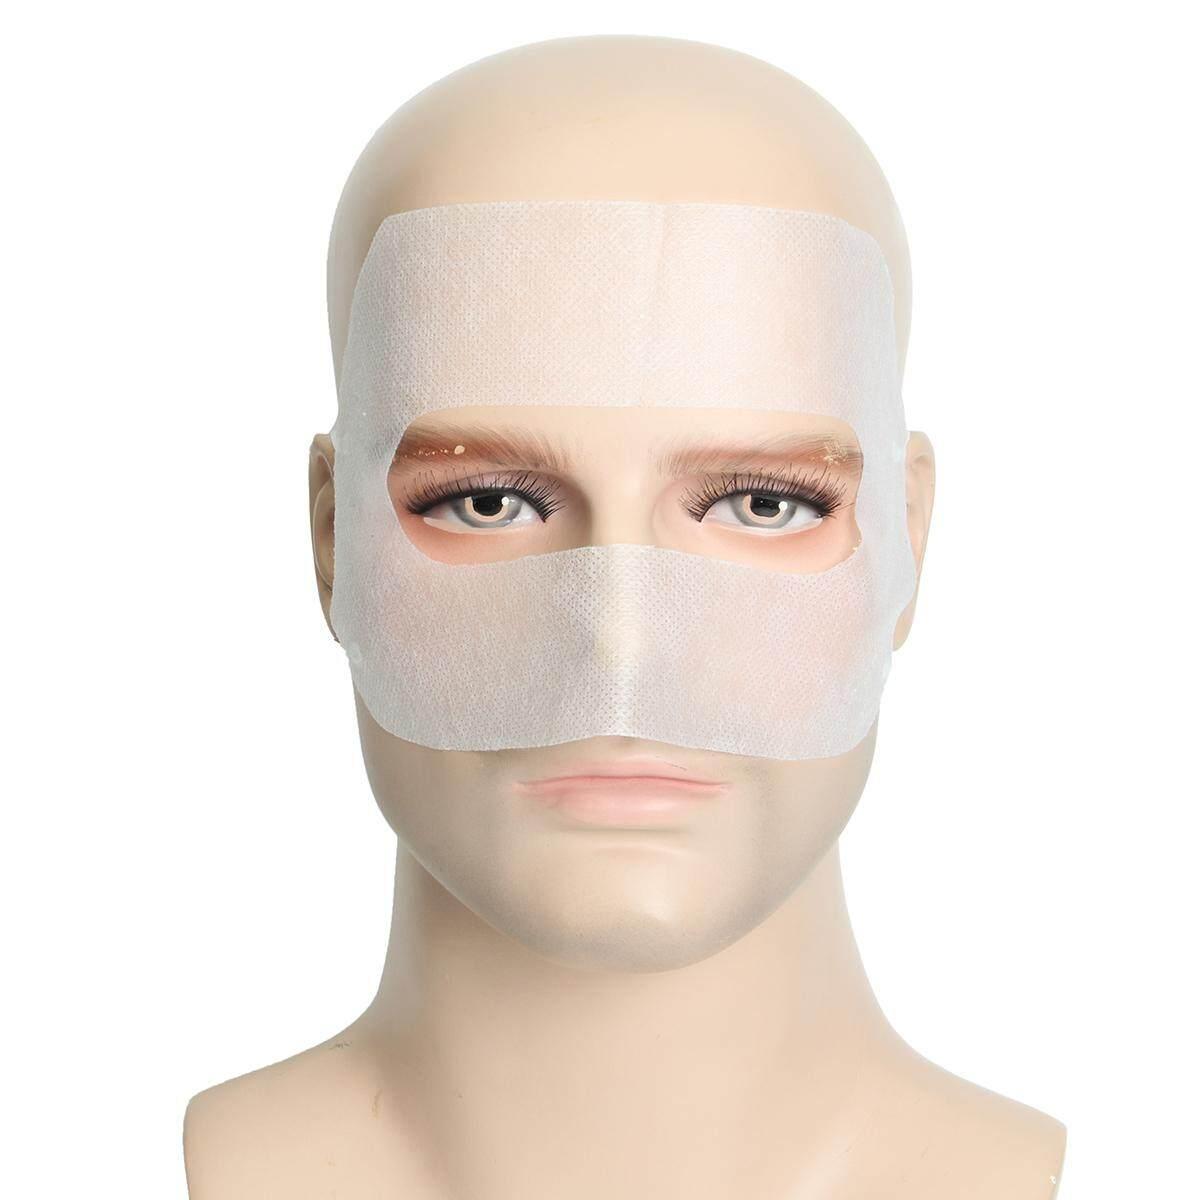 100 Pcs Protective Hygiene Eye Mask Ninja Mask For Vr Gear Vr Glasses.